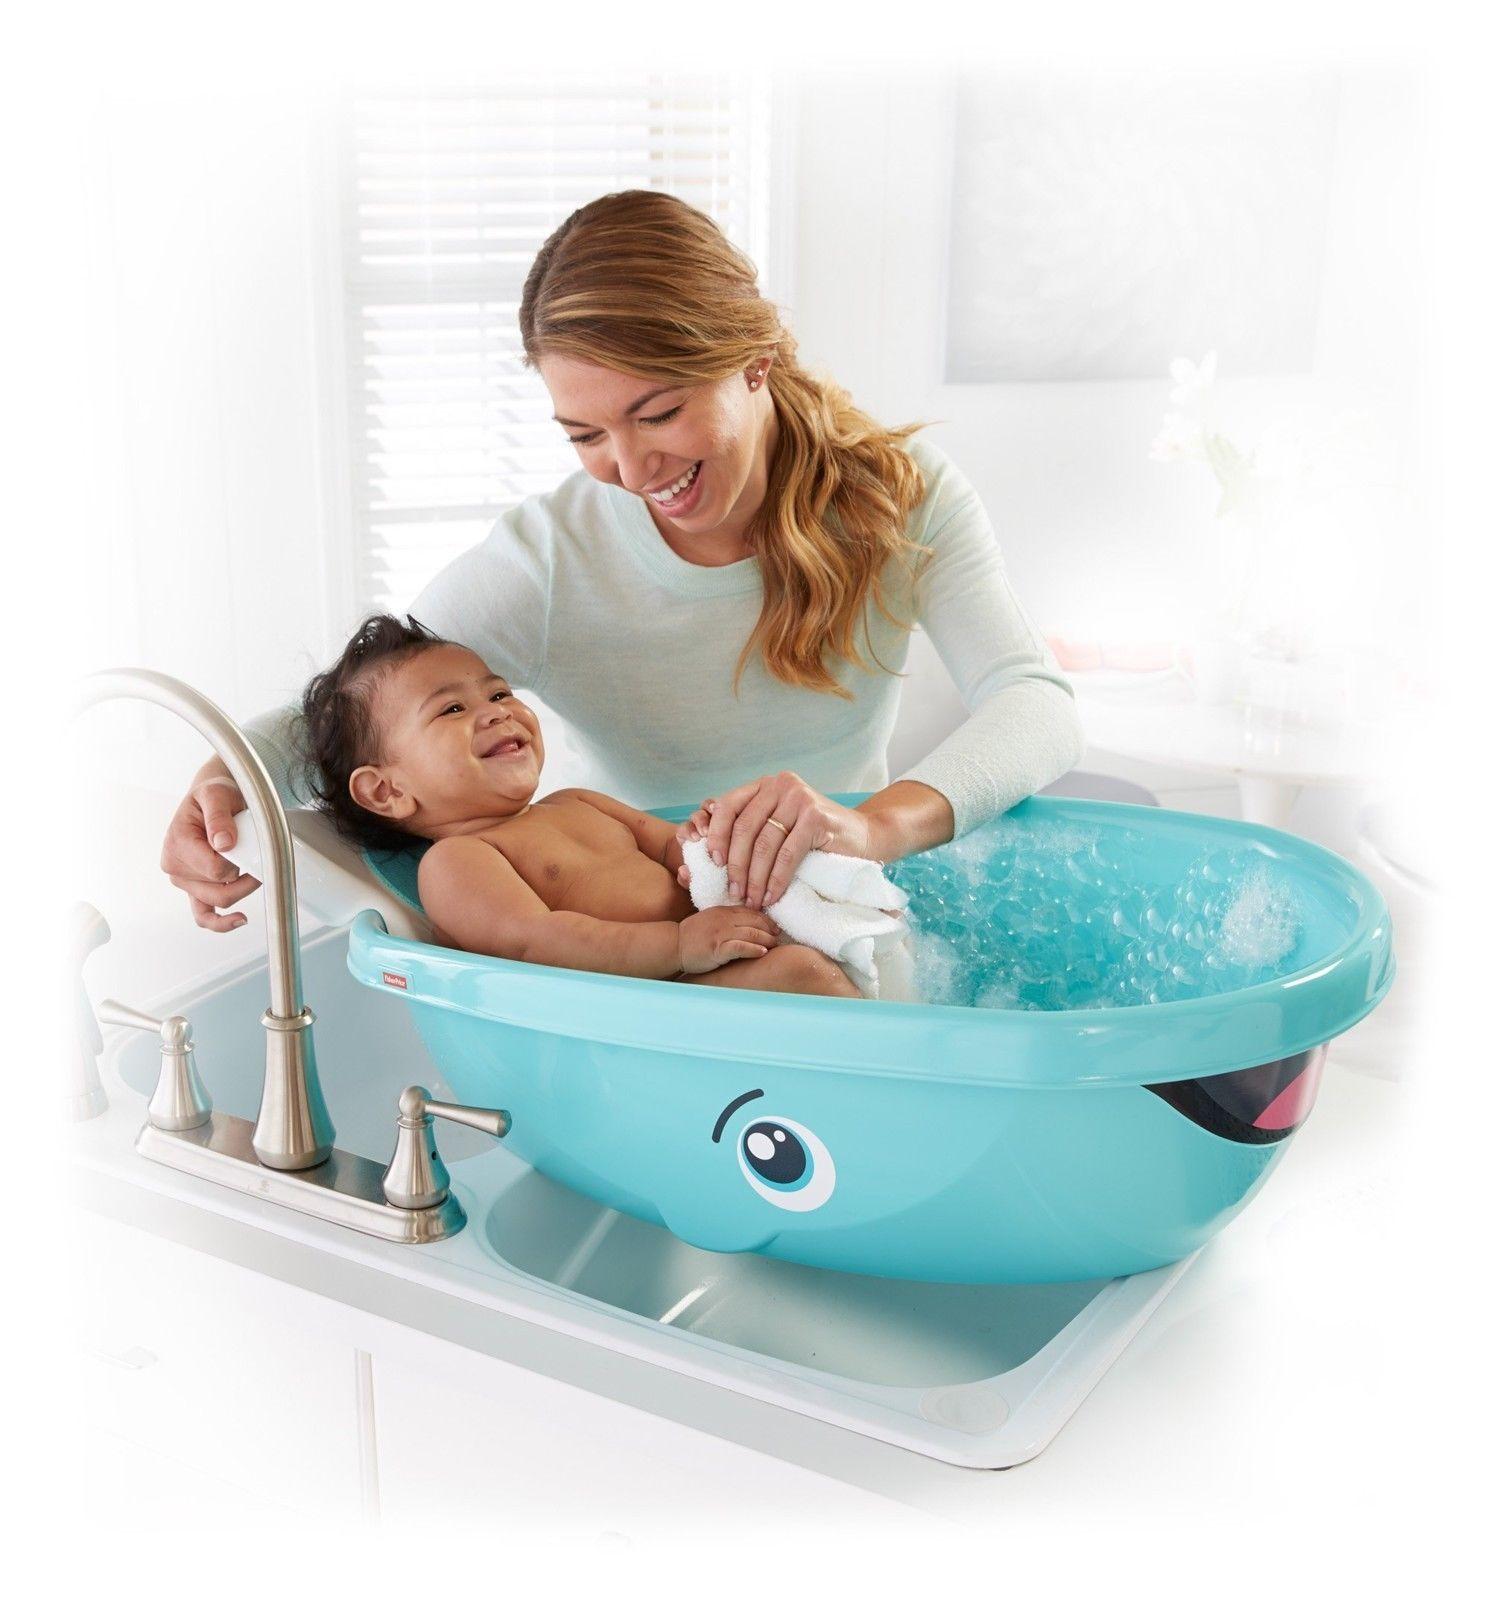 Fisher Price Whale Kids Toddler Newborn Shower Bath Safety Seat Tub ...